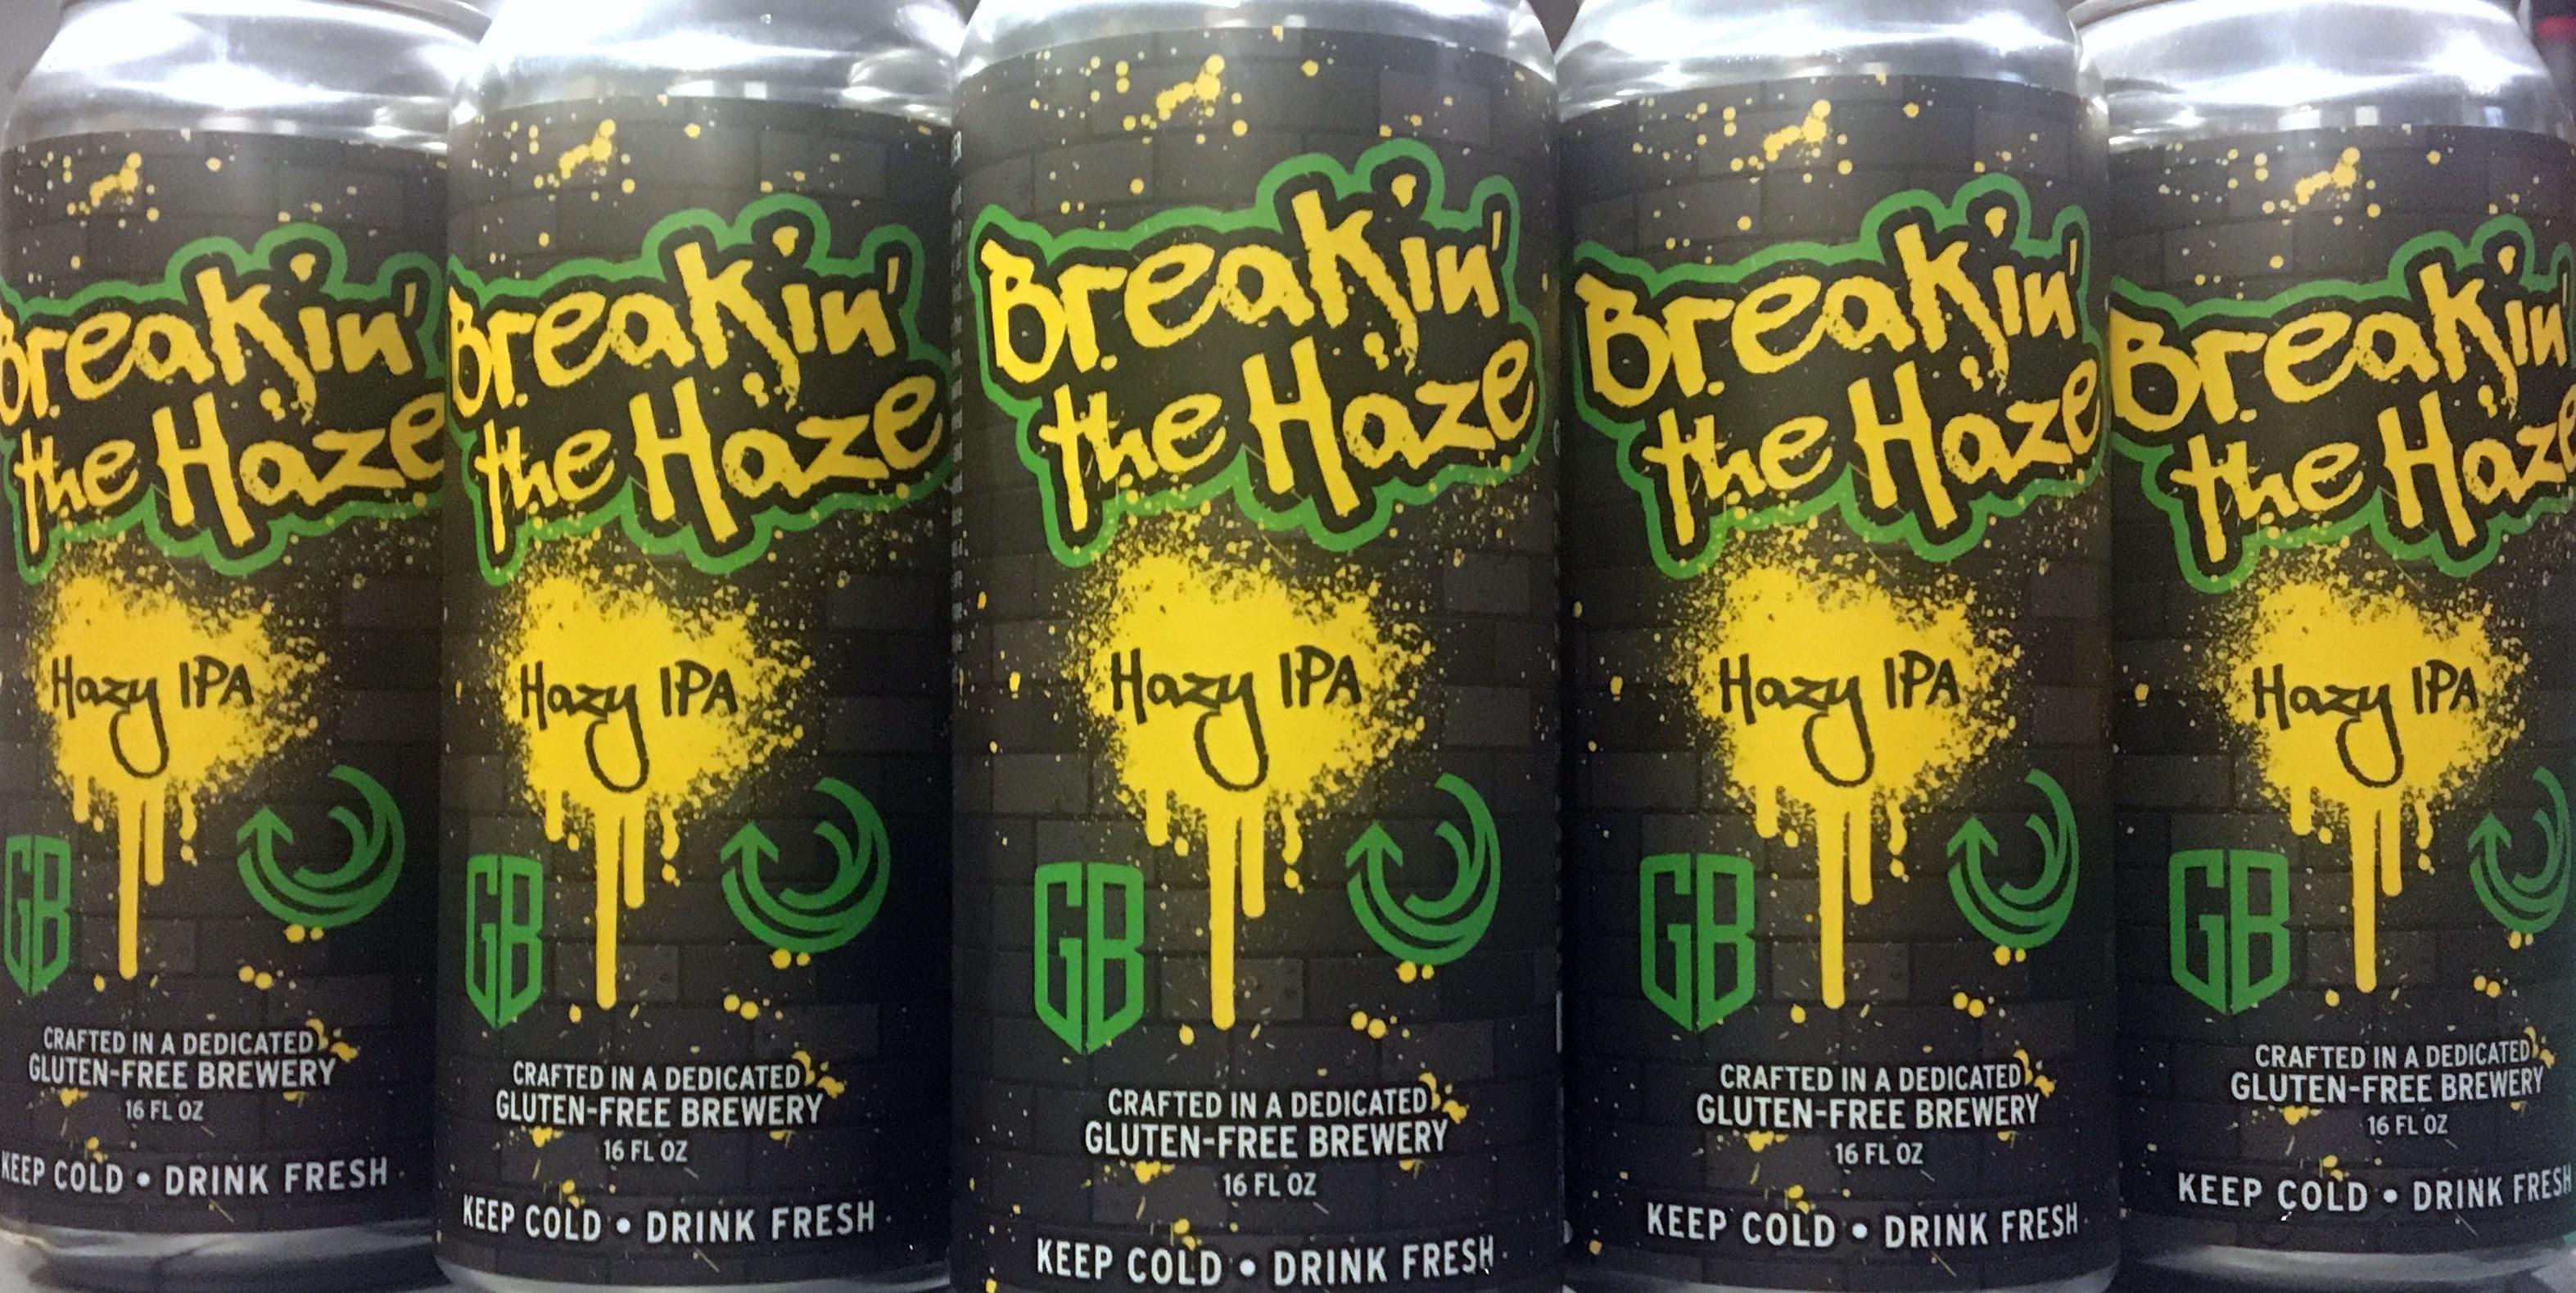 image of Breakin' the Haze - Gluten-Free Hazy IPA courtesy of Ground Breaker Brewing